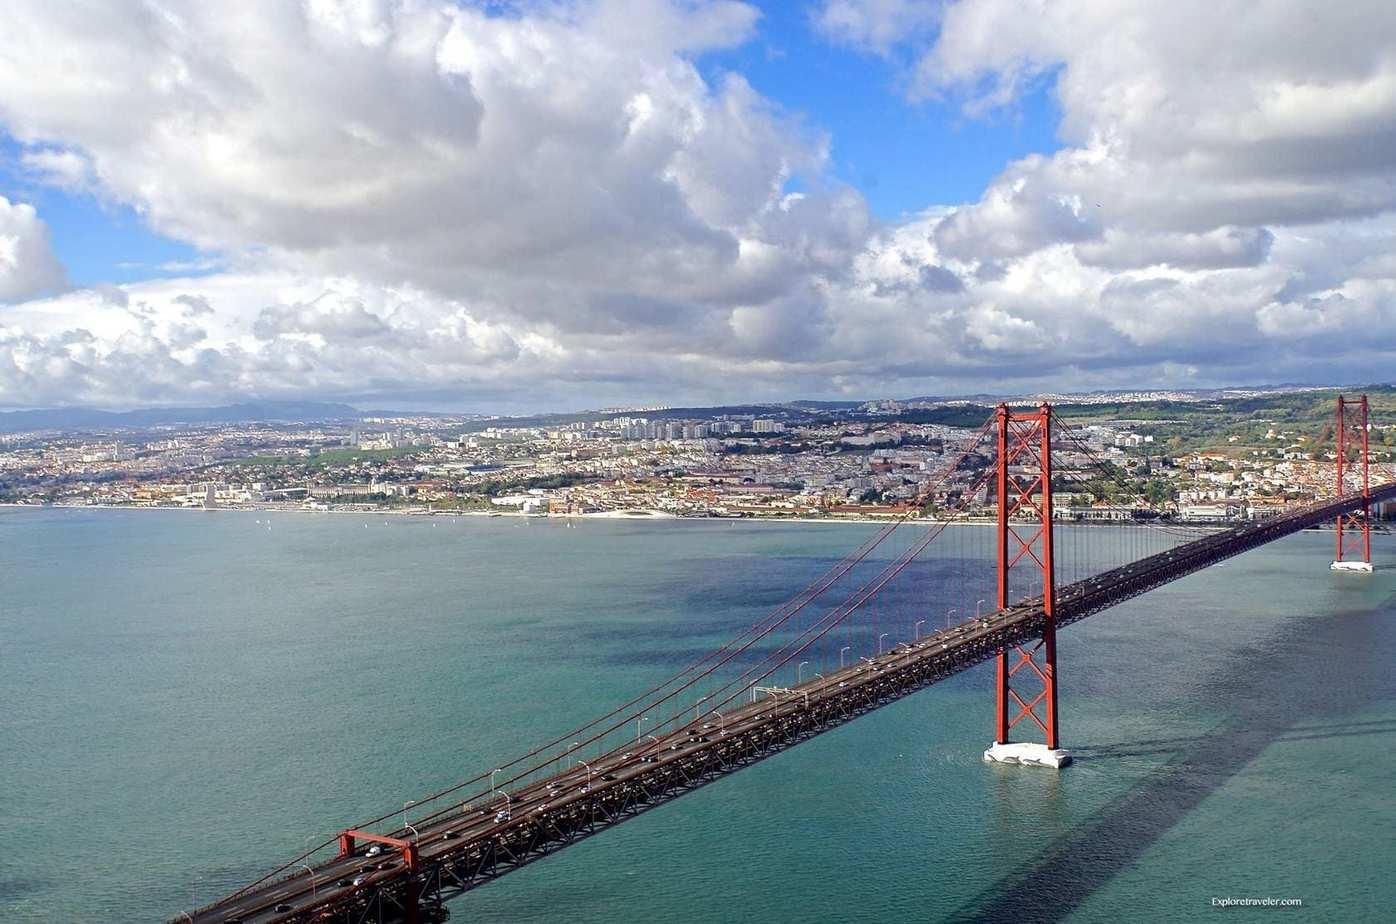 ExploreTraveler Presents: Exploring Lisbon Portugal Part 1 - A bridge over a body of water - Ponte 25 de Abril